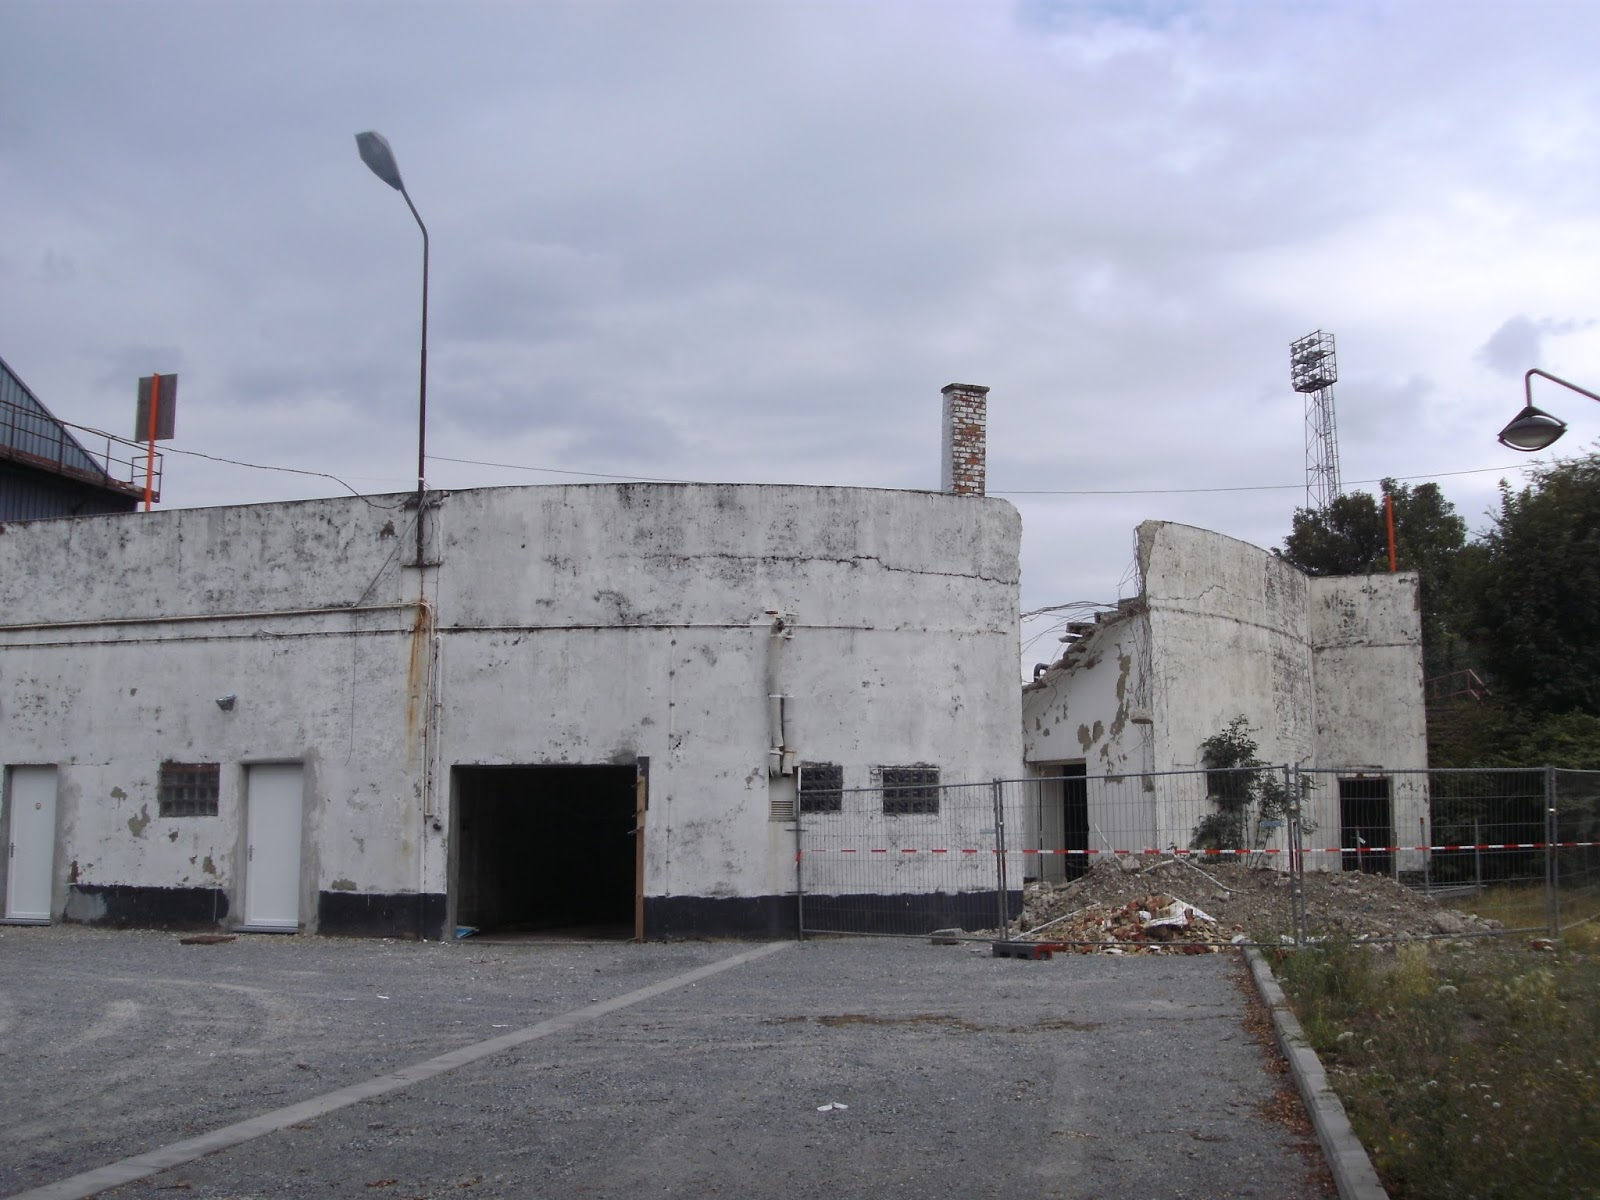 Club de rencontres charleroi